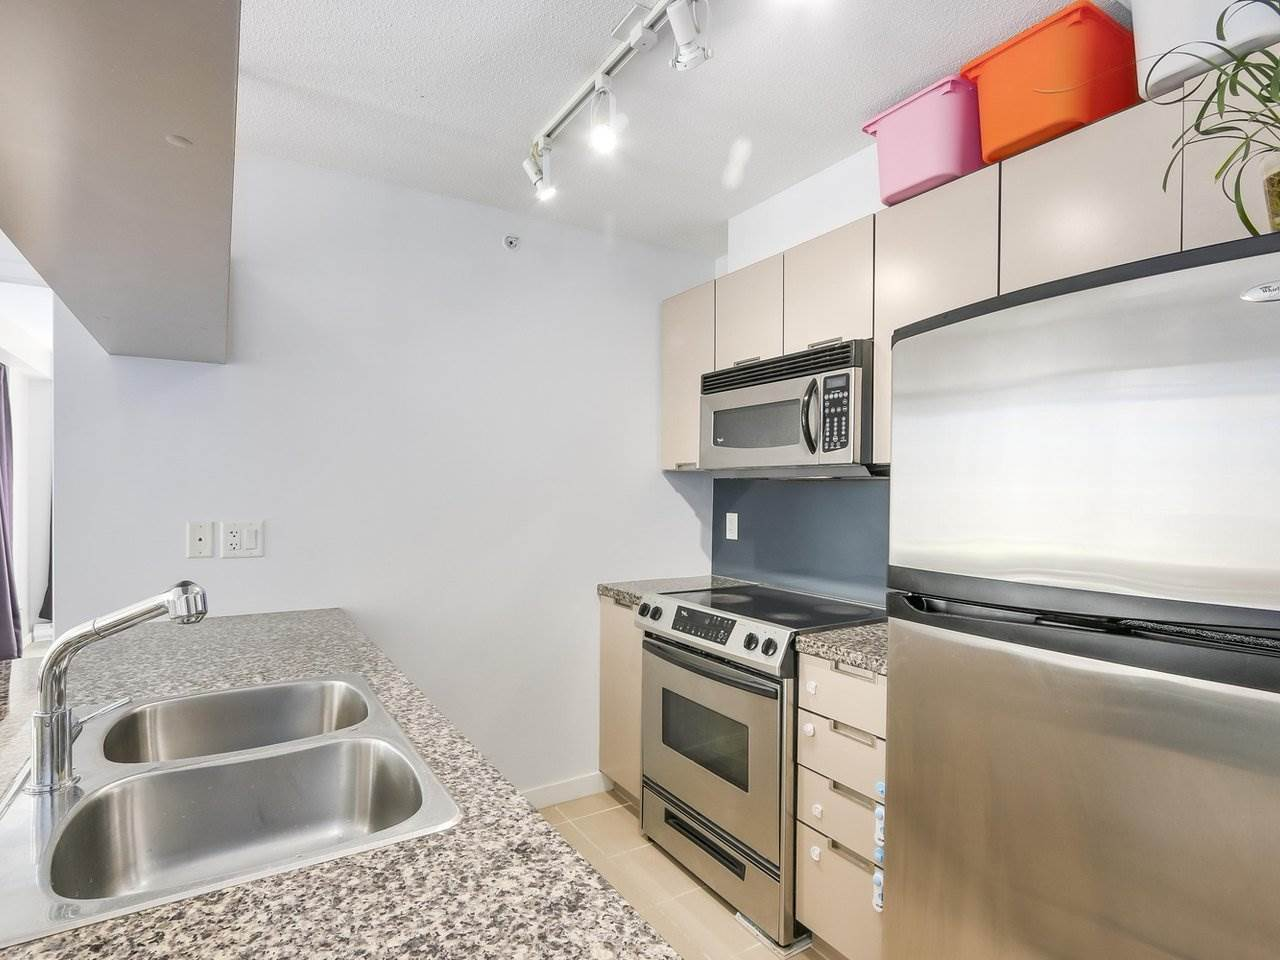 Condo Apartment at 808 1082 SEYMOUR STREET, Unit 808, Vancouver West, British Columbia. Image 3